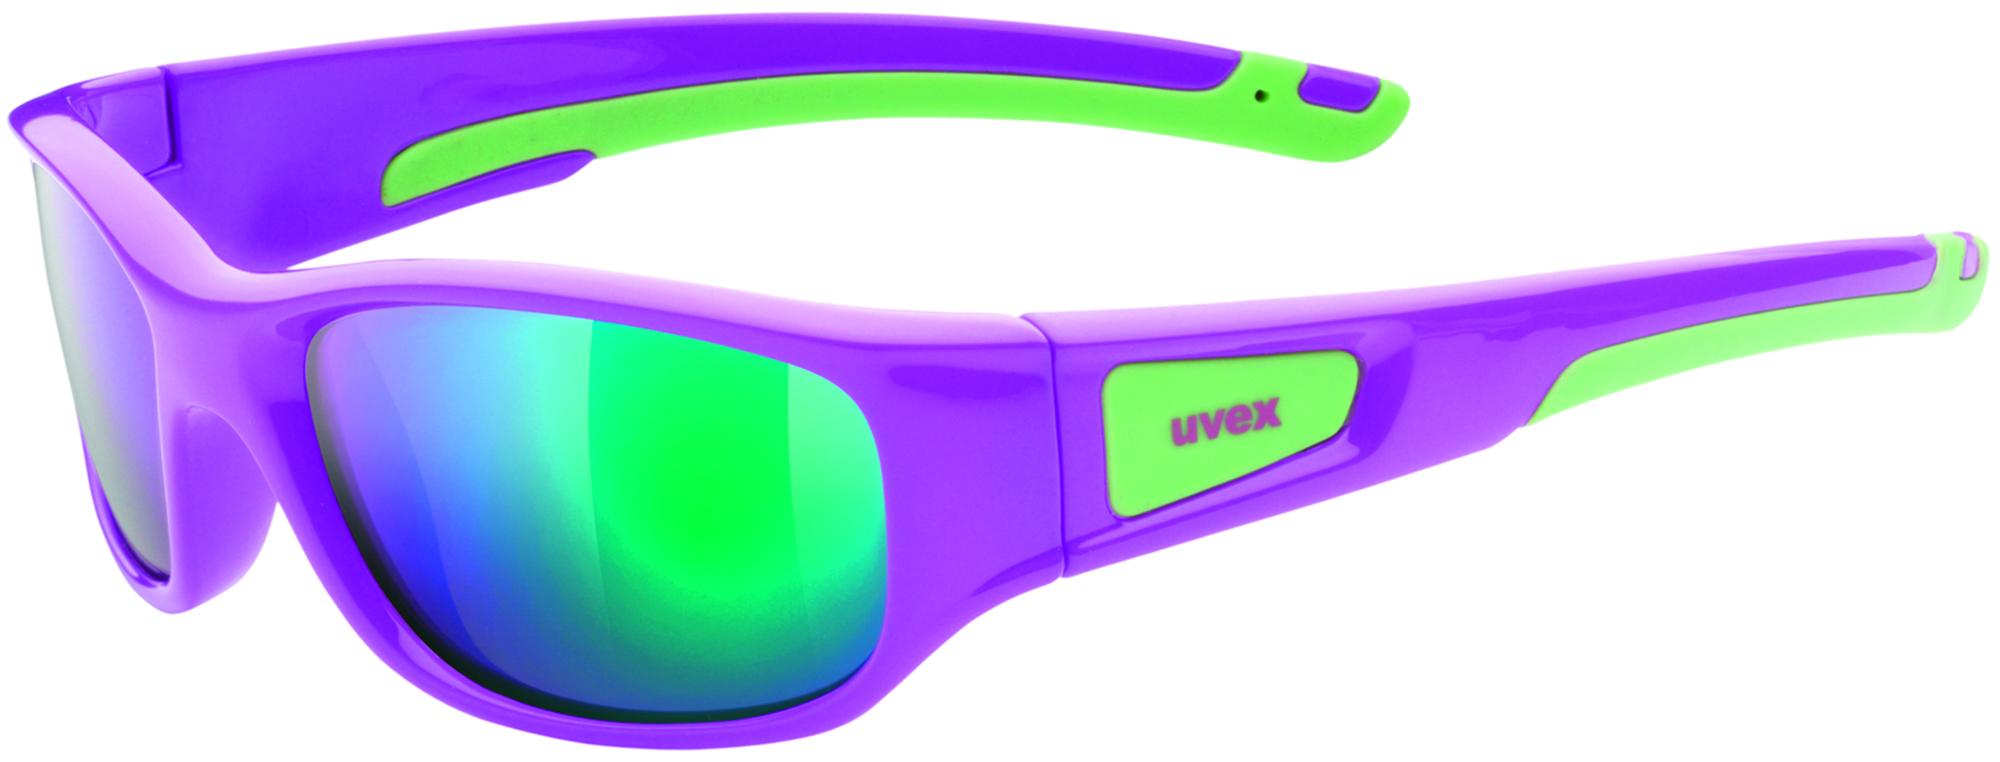 Uvex Солнцезащитные очки детские Uvex Sportstyle 506